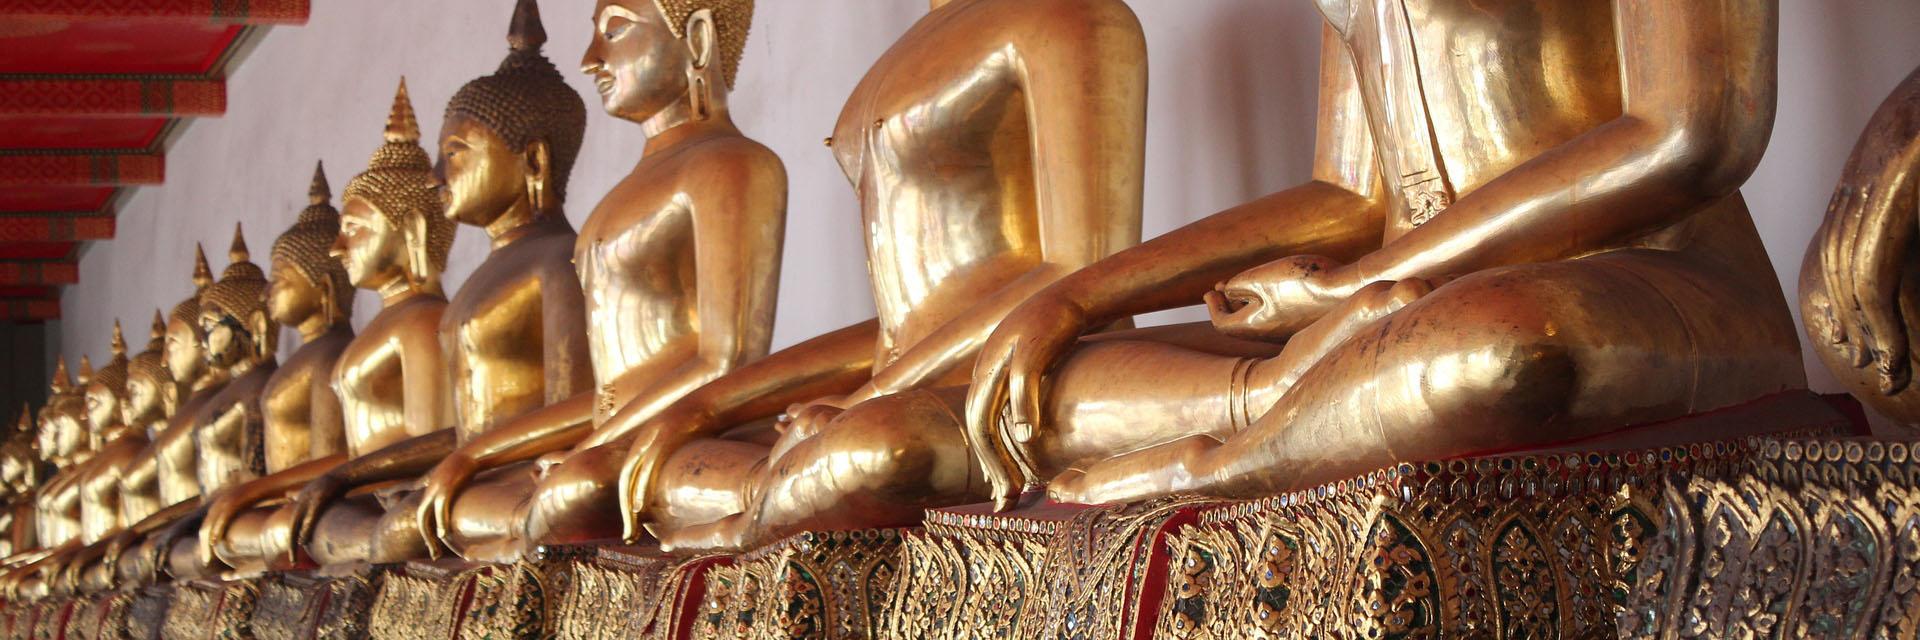 bangkok-buddha